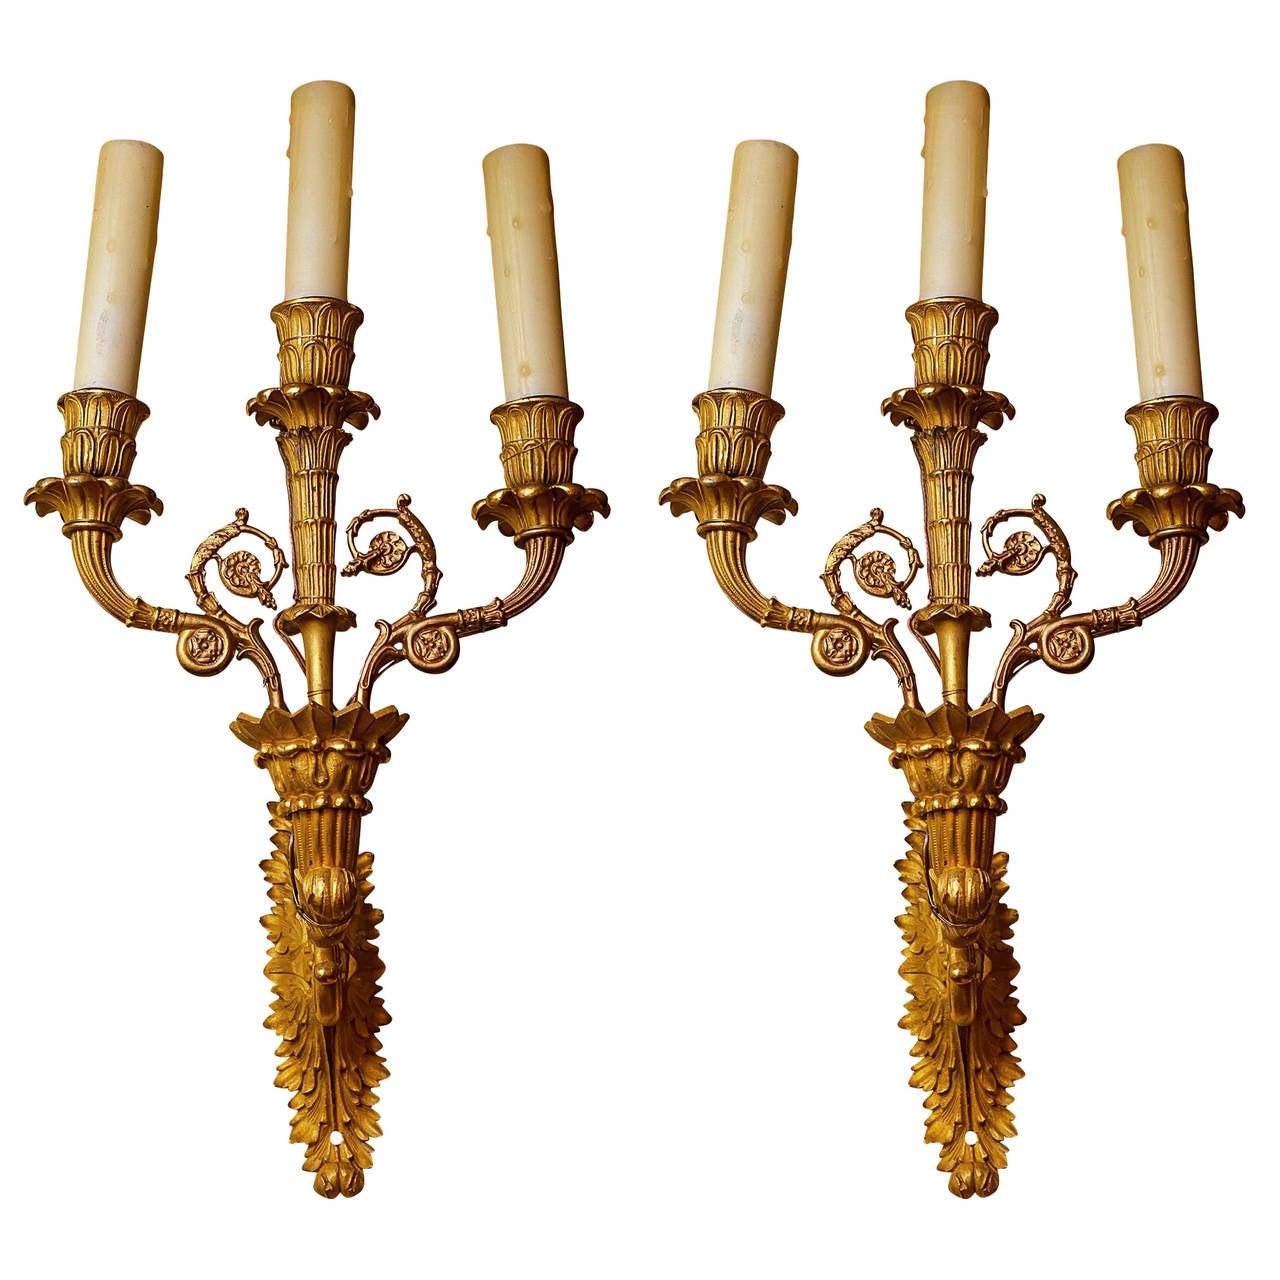 Pair of Emire Style Gilt Bronze Three-Arm Wall Light Sconces